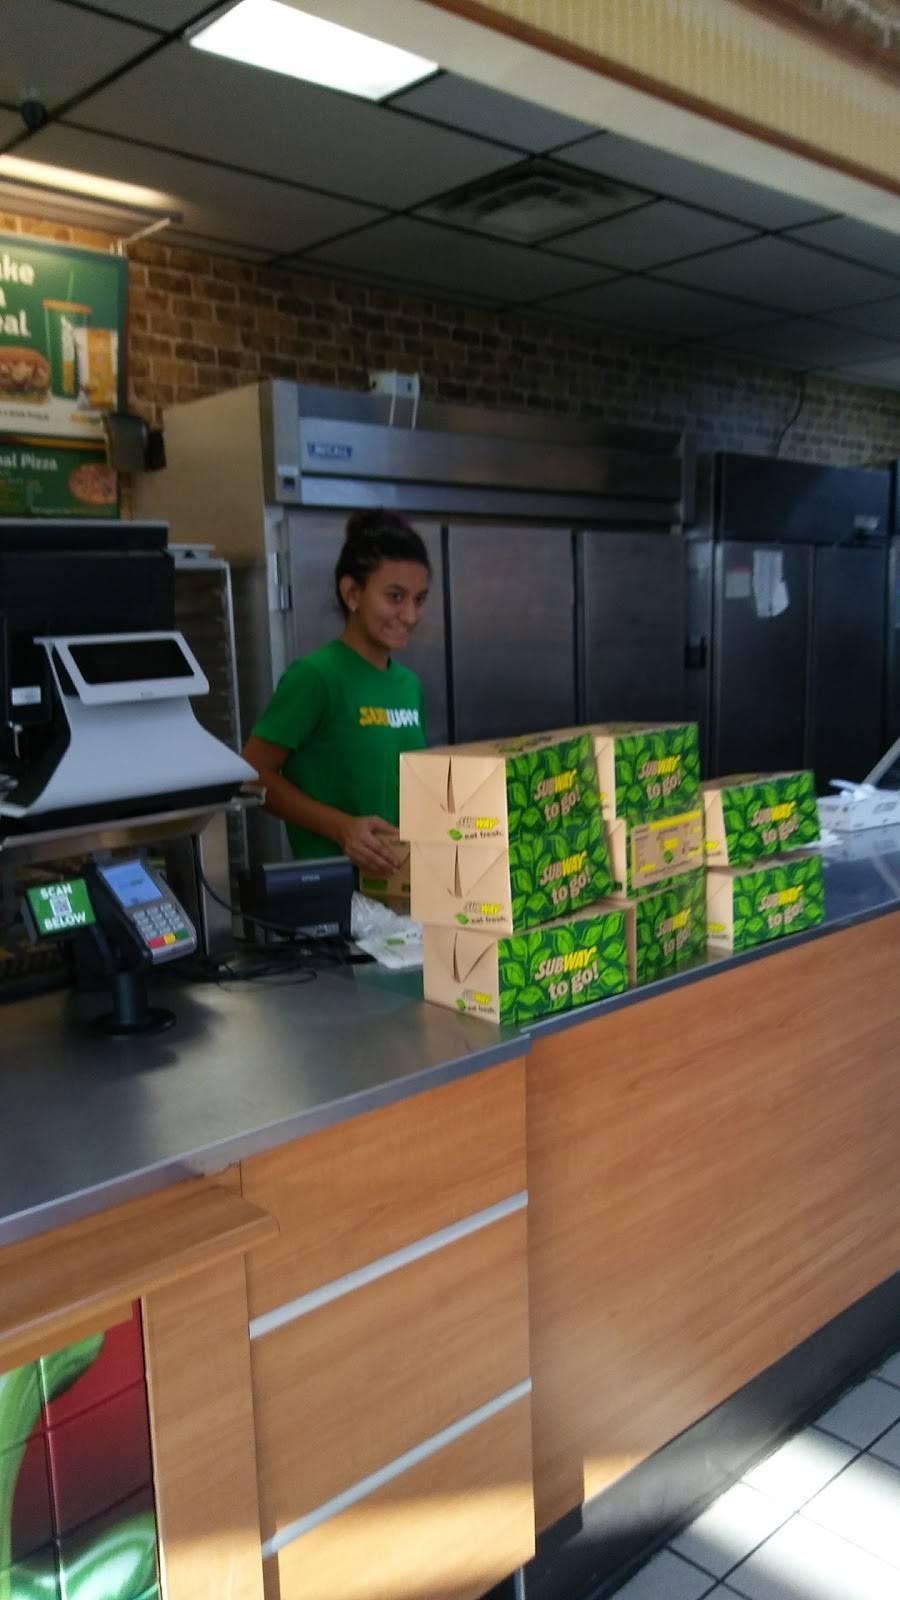 Subway - meal takeaway  | Photo 3 of 7 | Address: 4948 N Peoria Ave, Tulsa, OK 74126, USA | Phone: (918) 425-6209